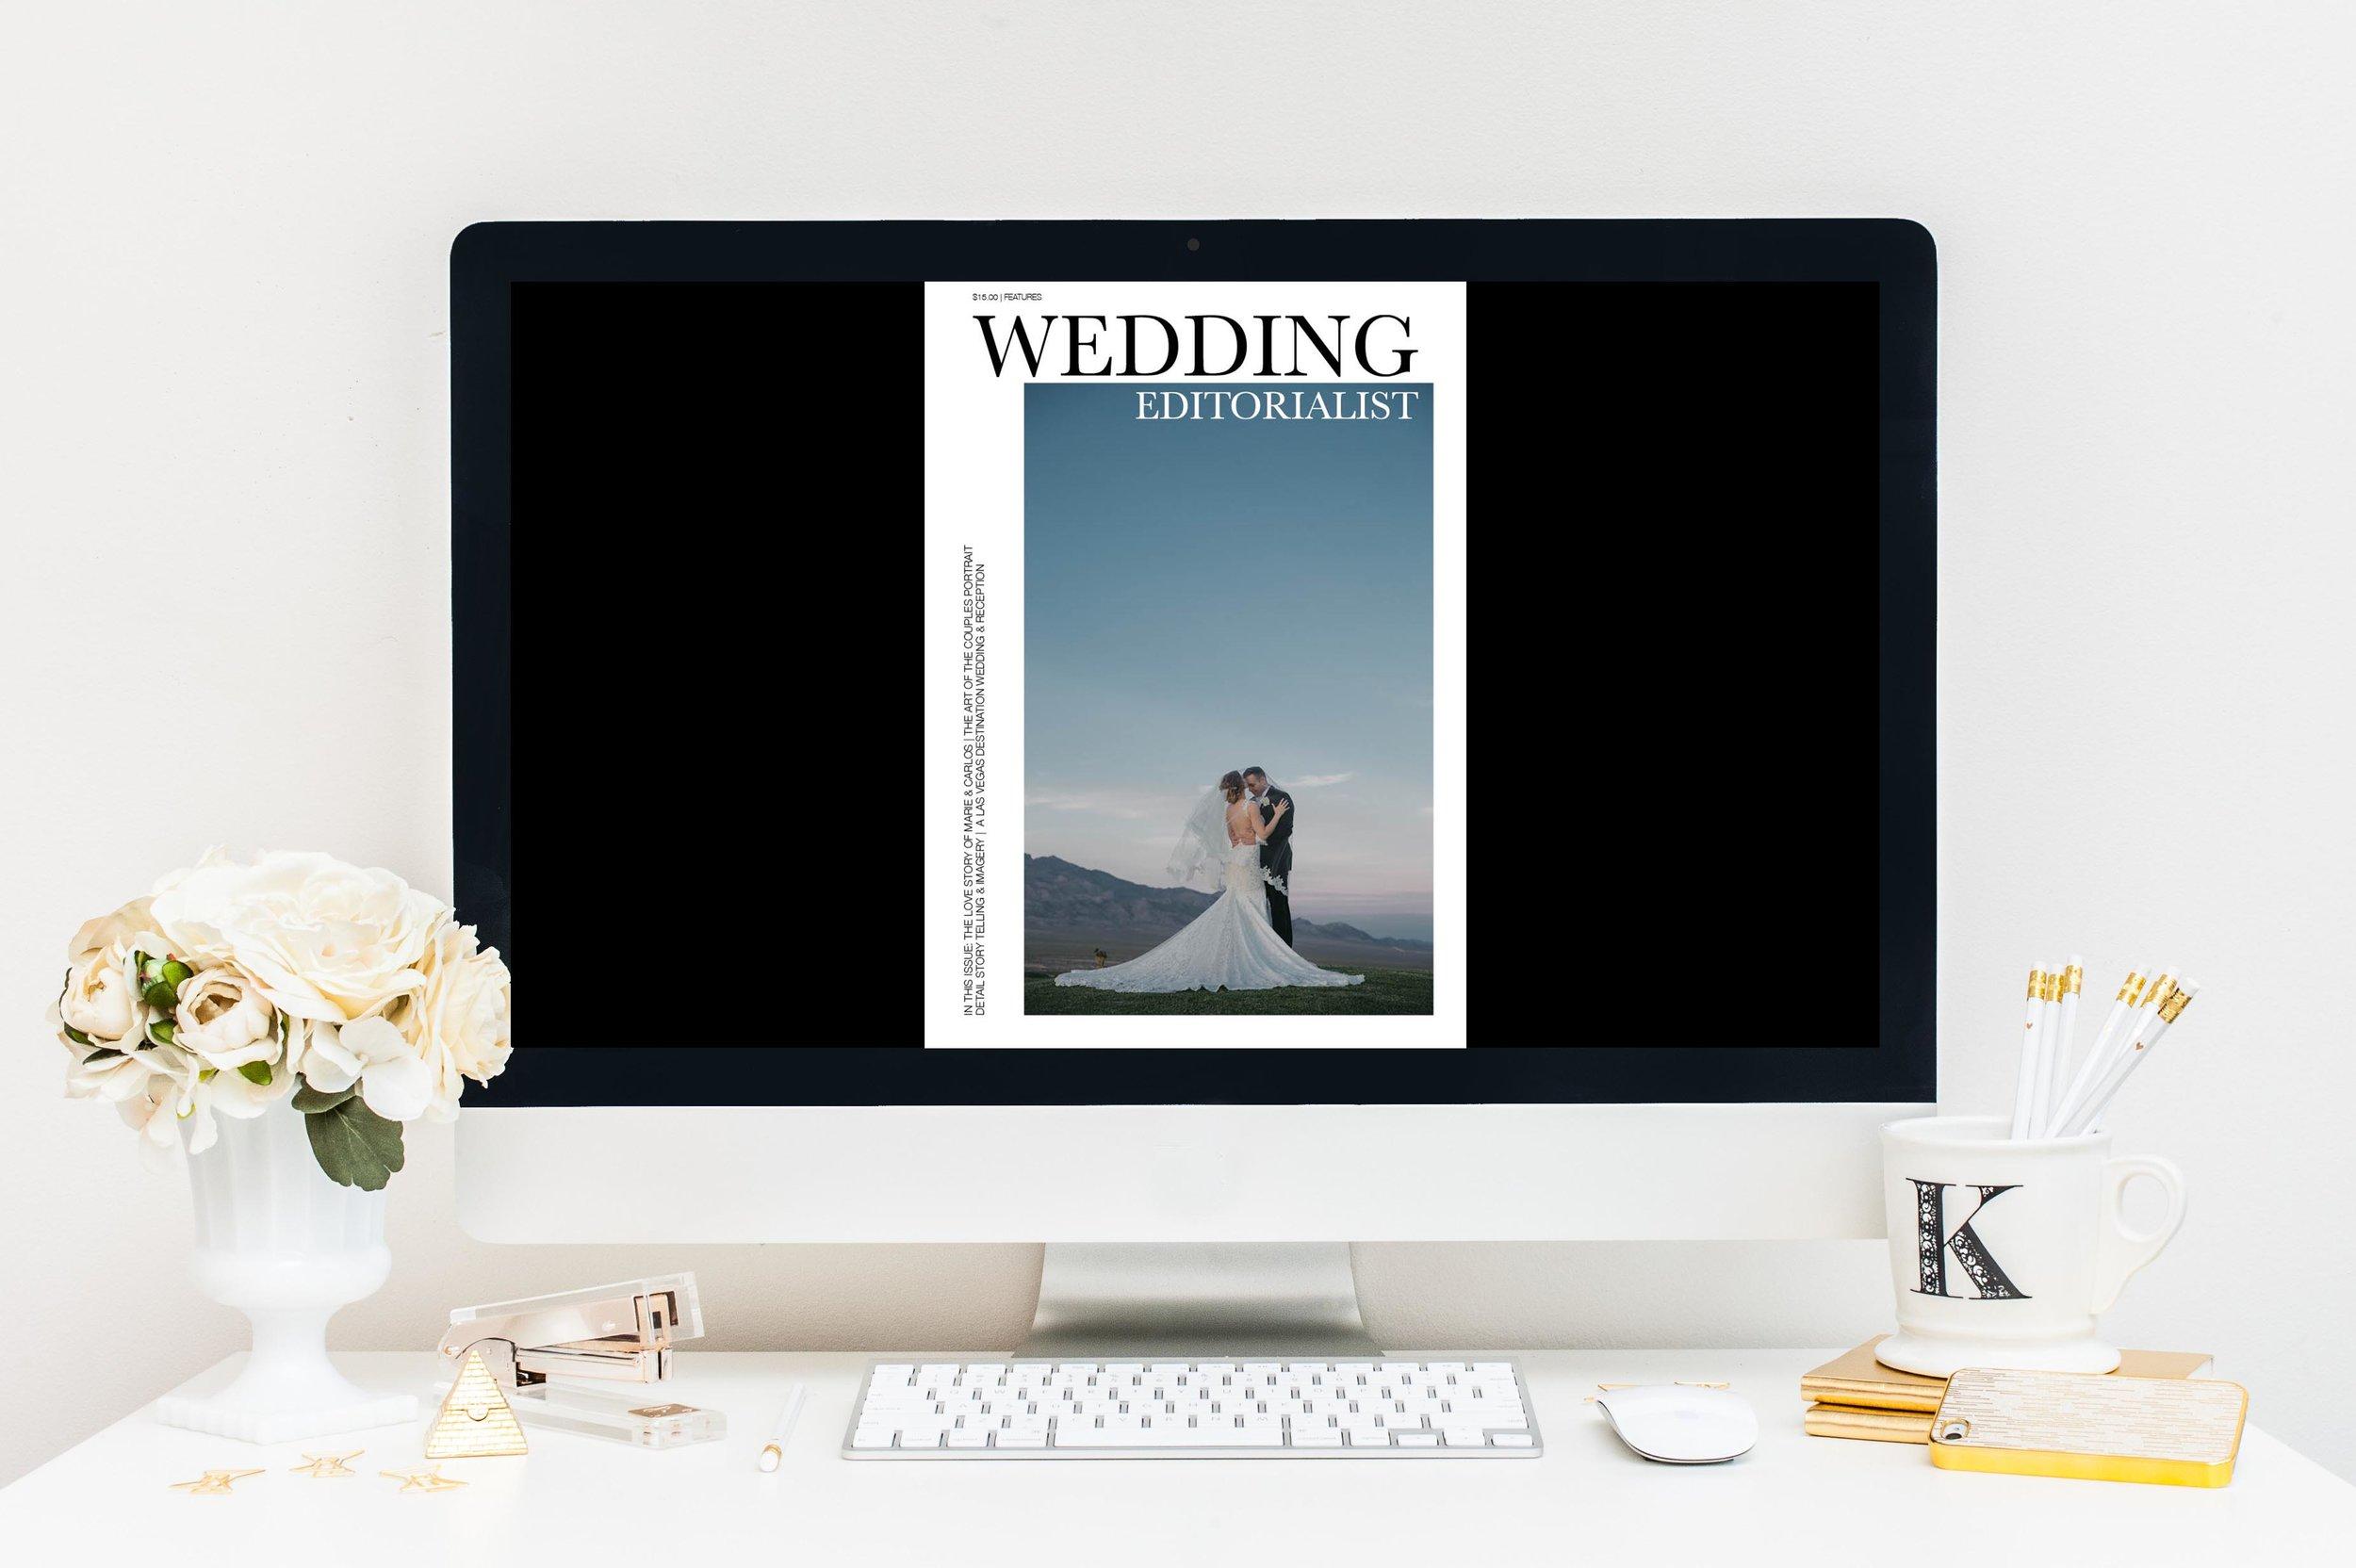 Personalized Wedding Magazinejpg